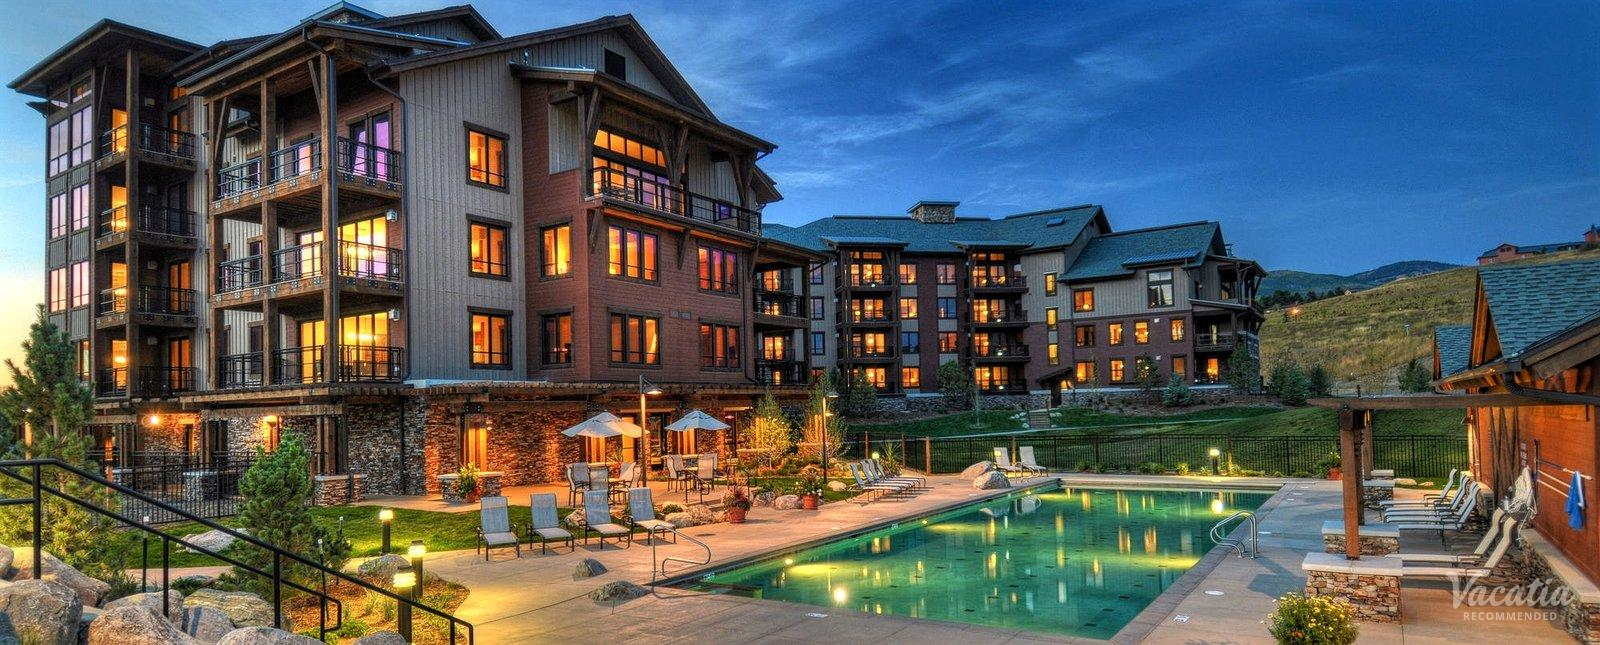 Trailhead Lodge by Steamboat Resorts.